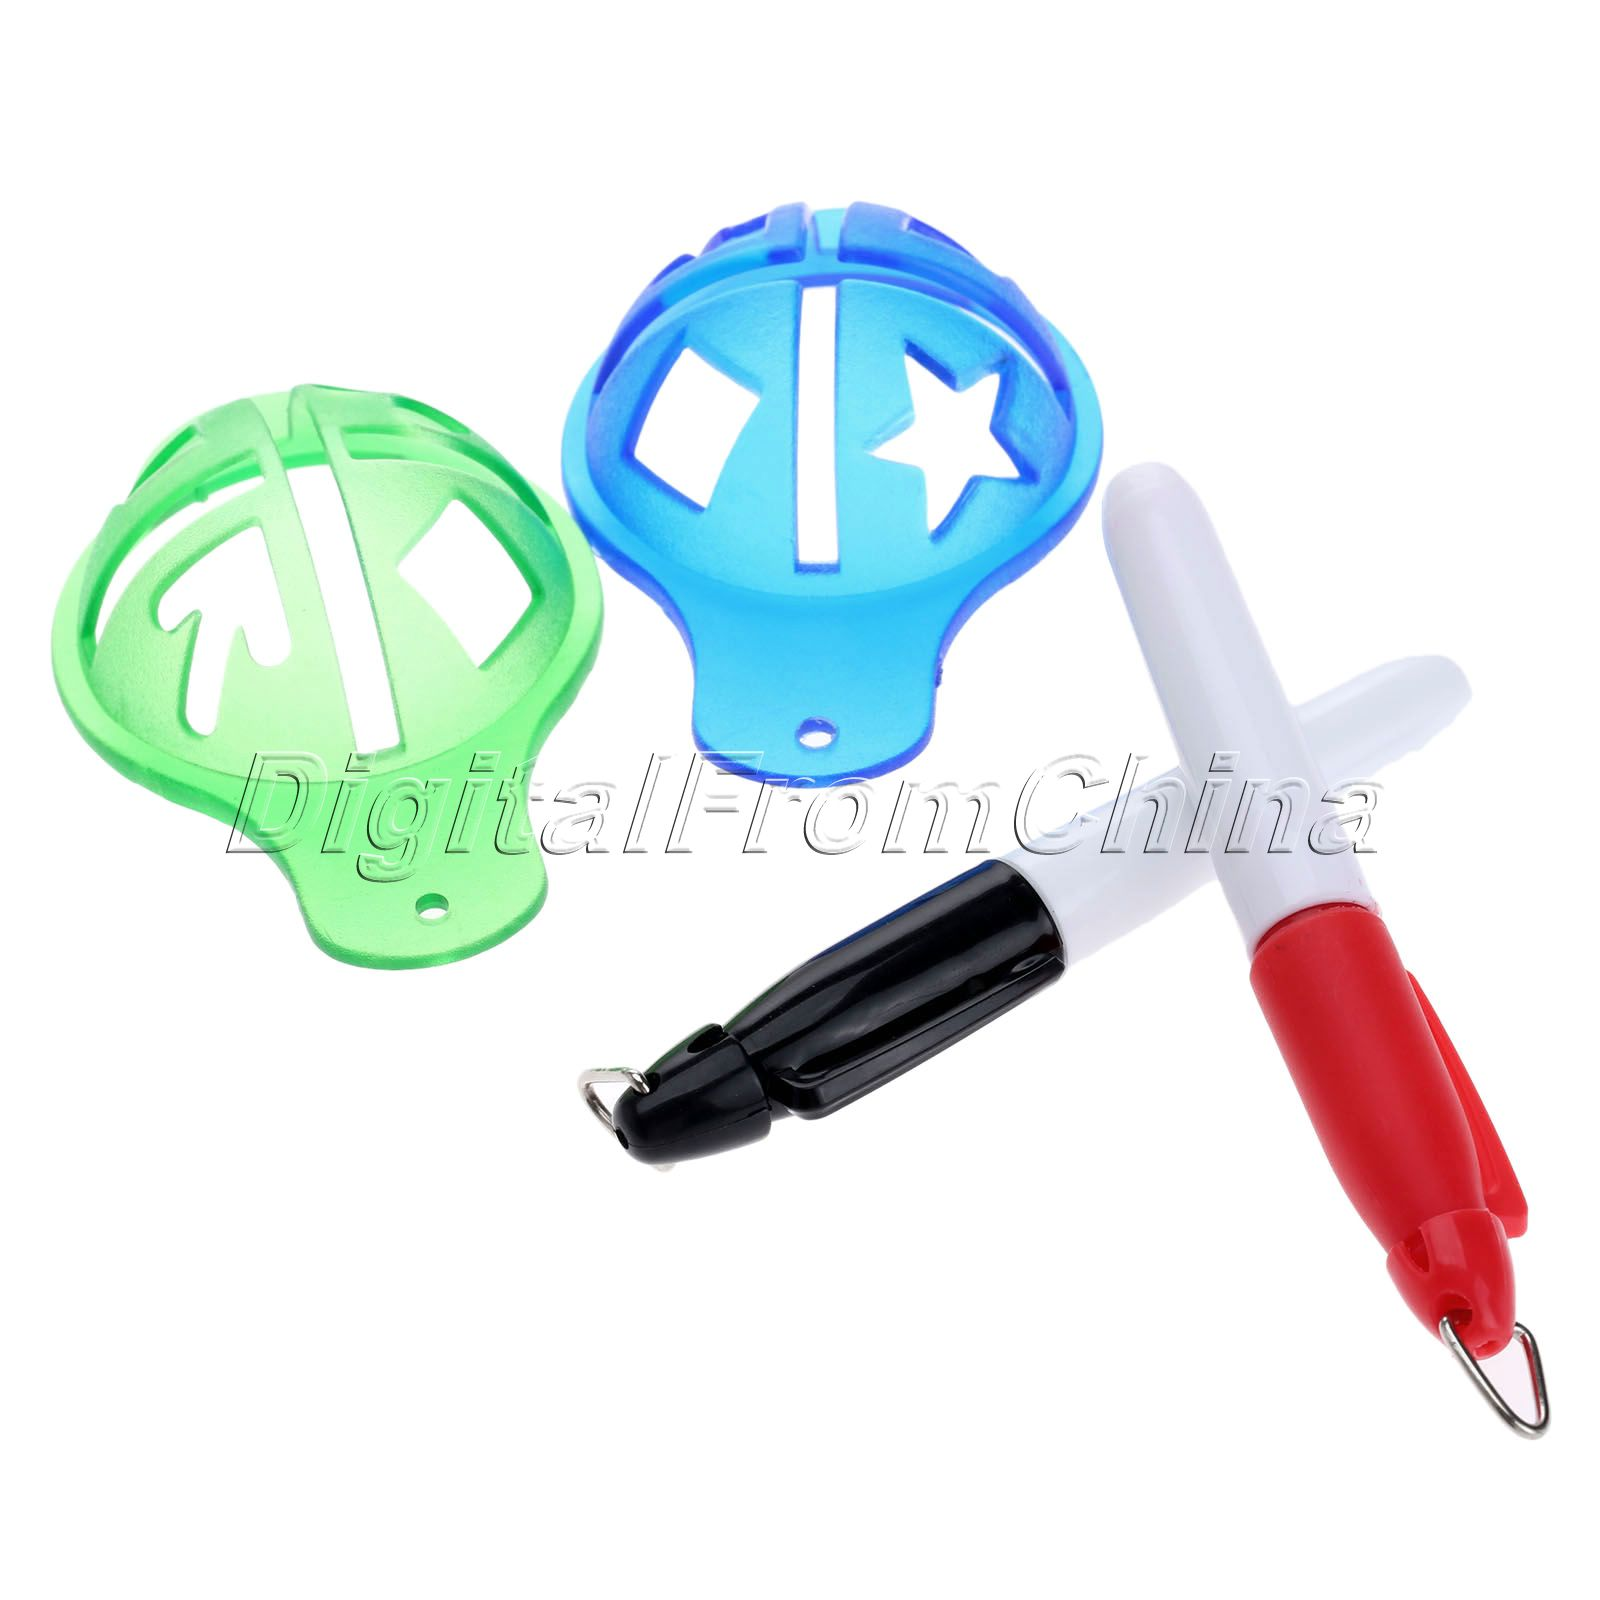 gohantee Golf Ball Liner Marcator Pen Ball Strokes Golf Formare SIDA - Golf - Fotografie 2